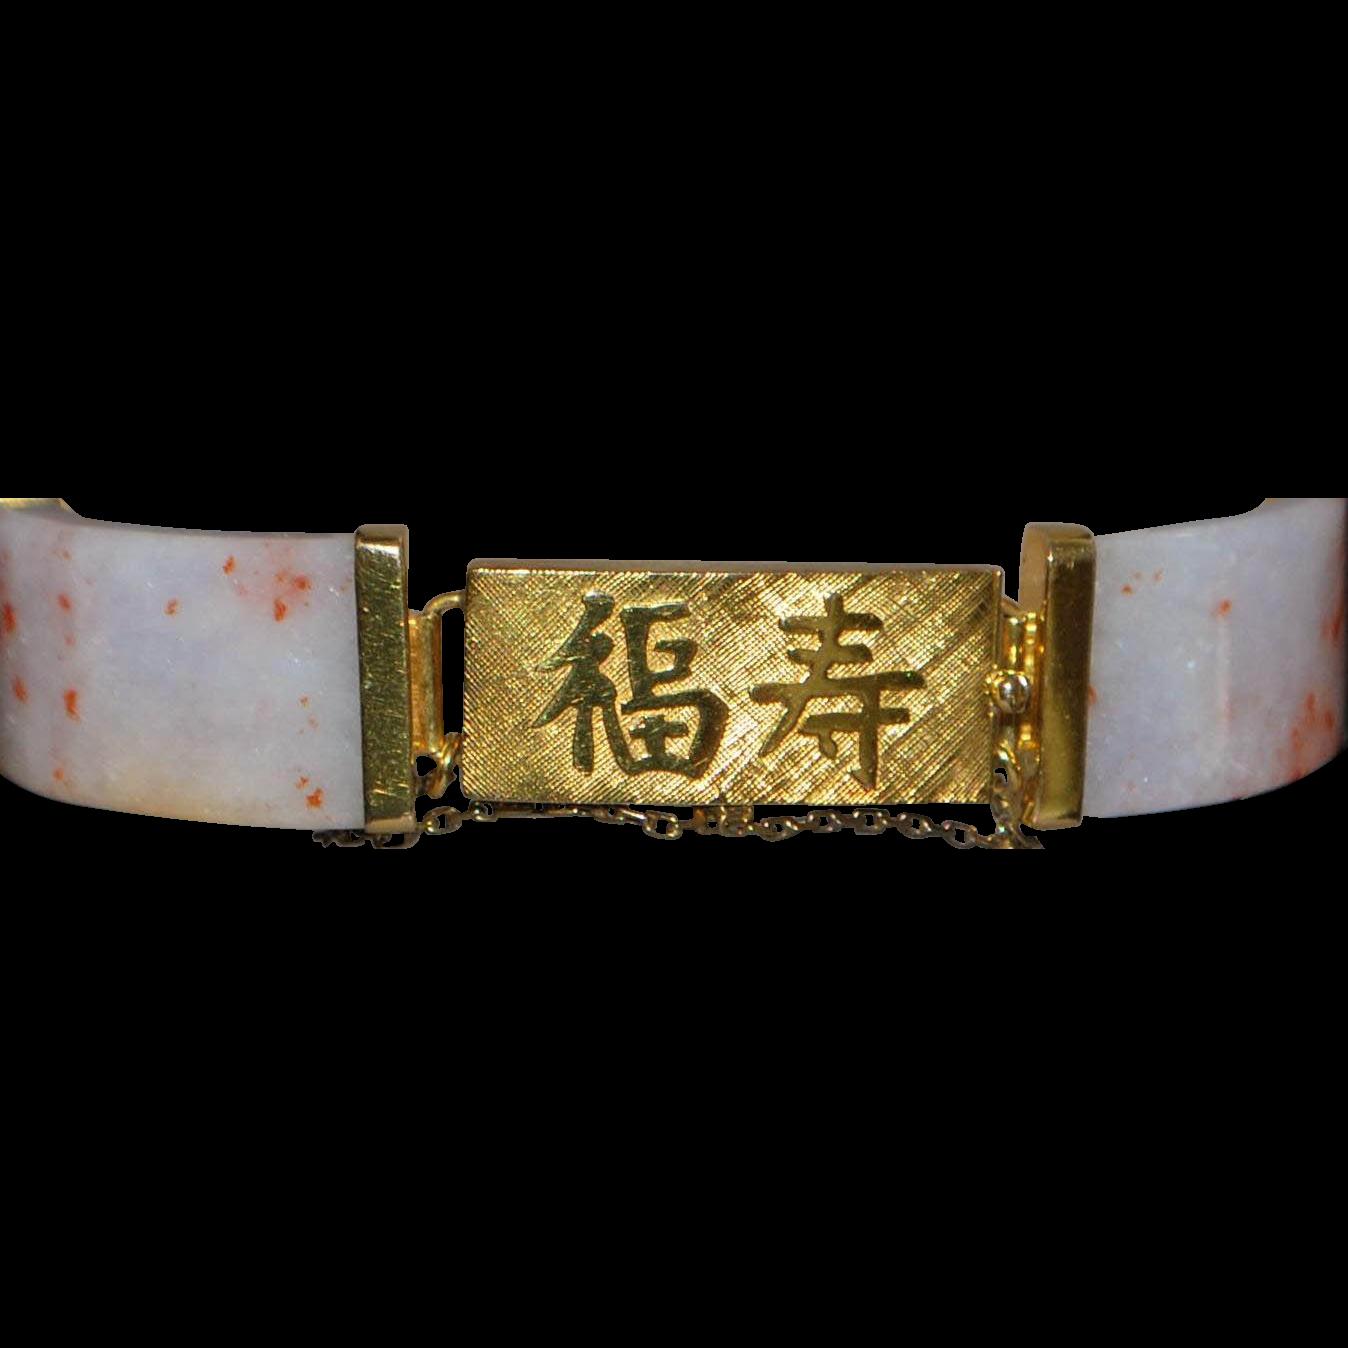 14K Custom Gold and Lavender Jade Bracelet - 1980's